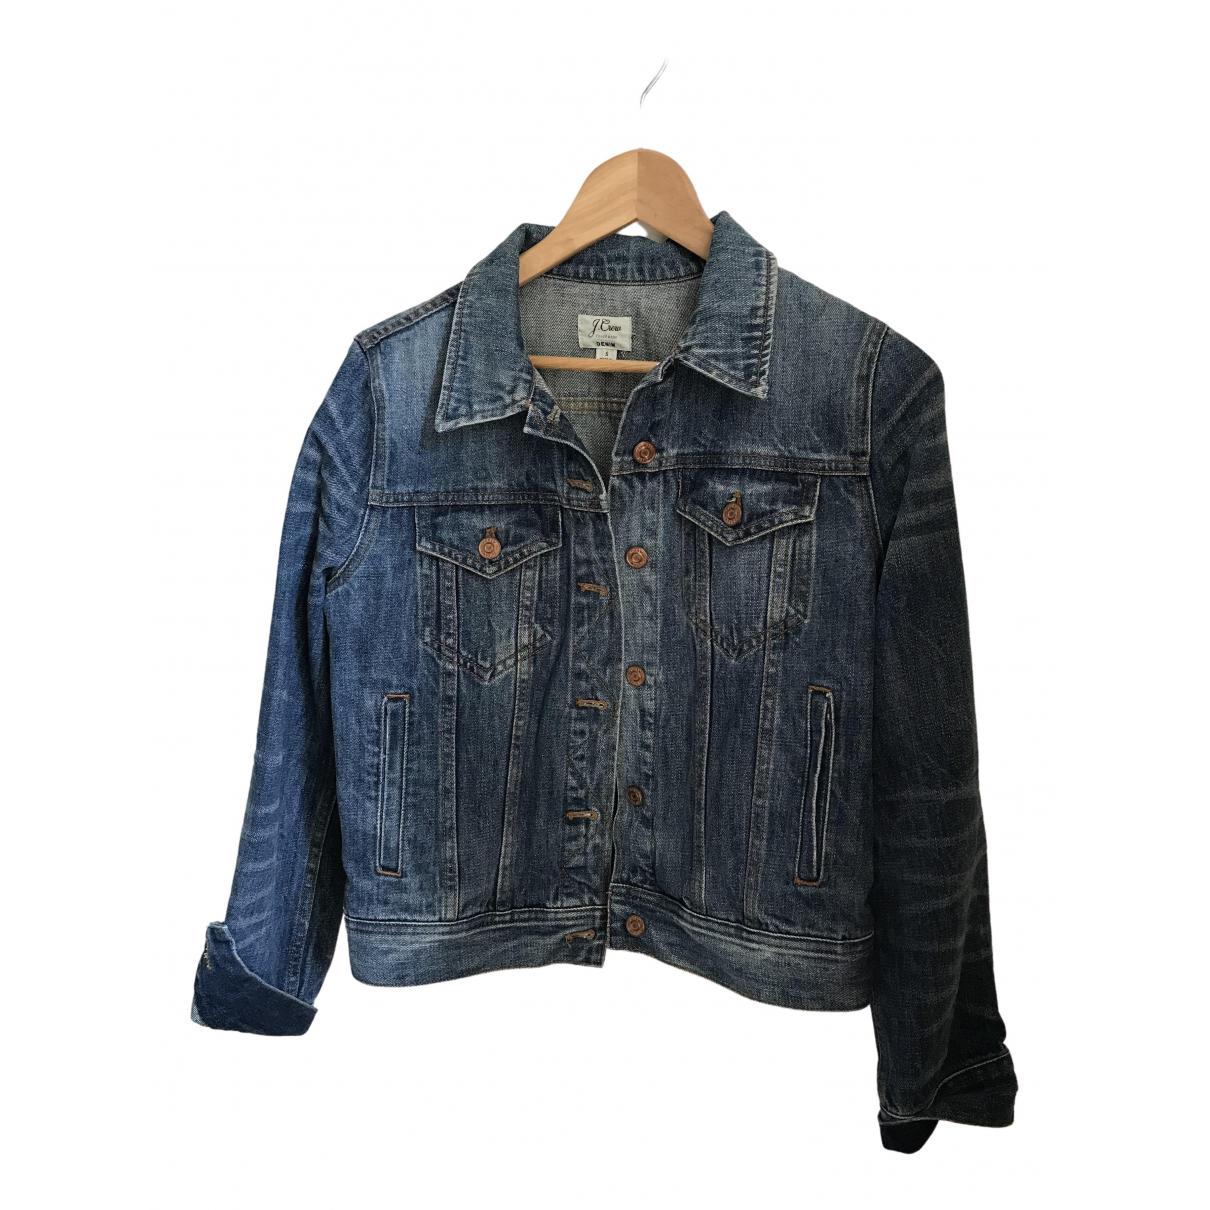 J.crew \N Blue Denim - Jeans jacket for Women S International